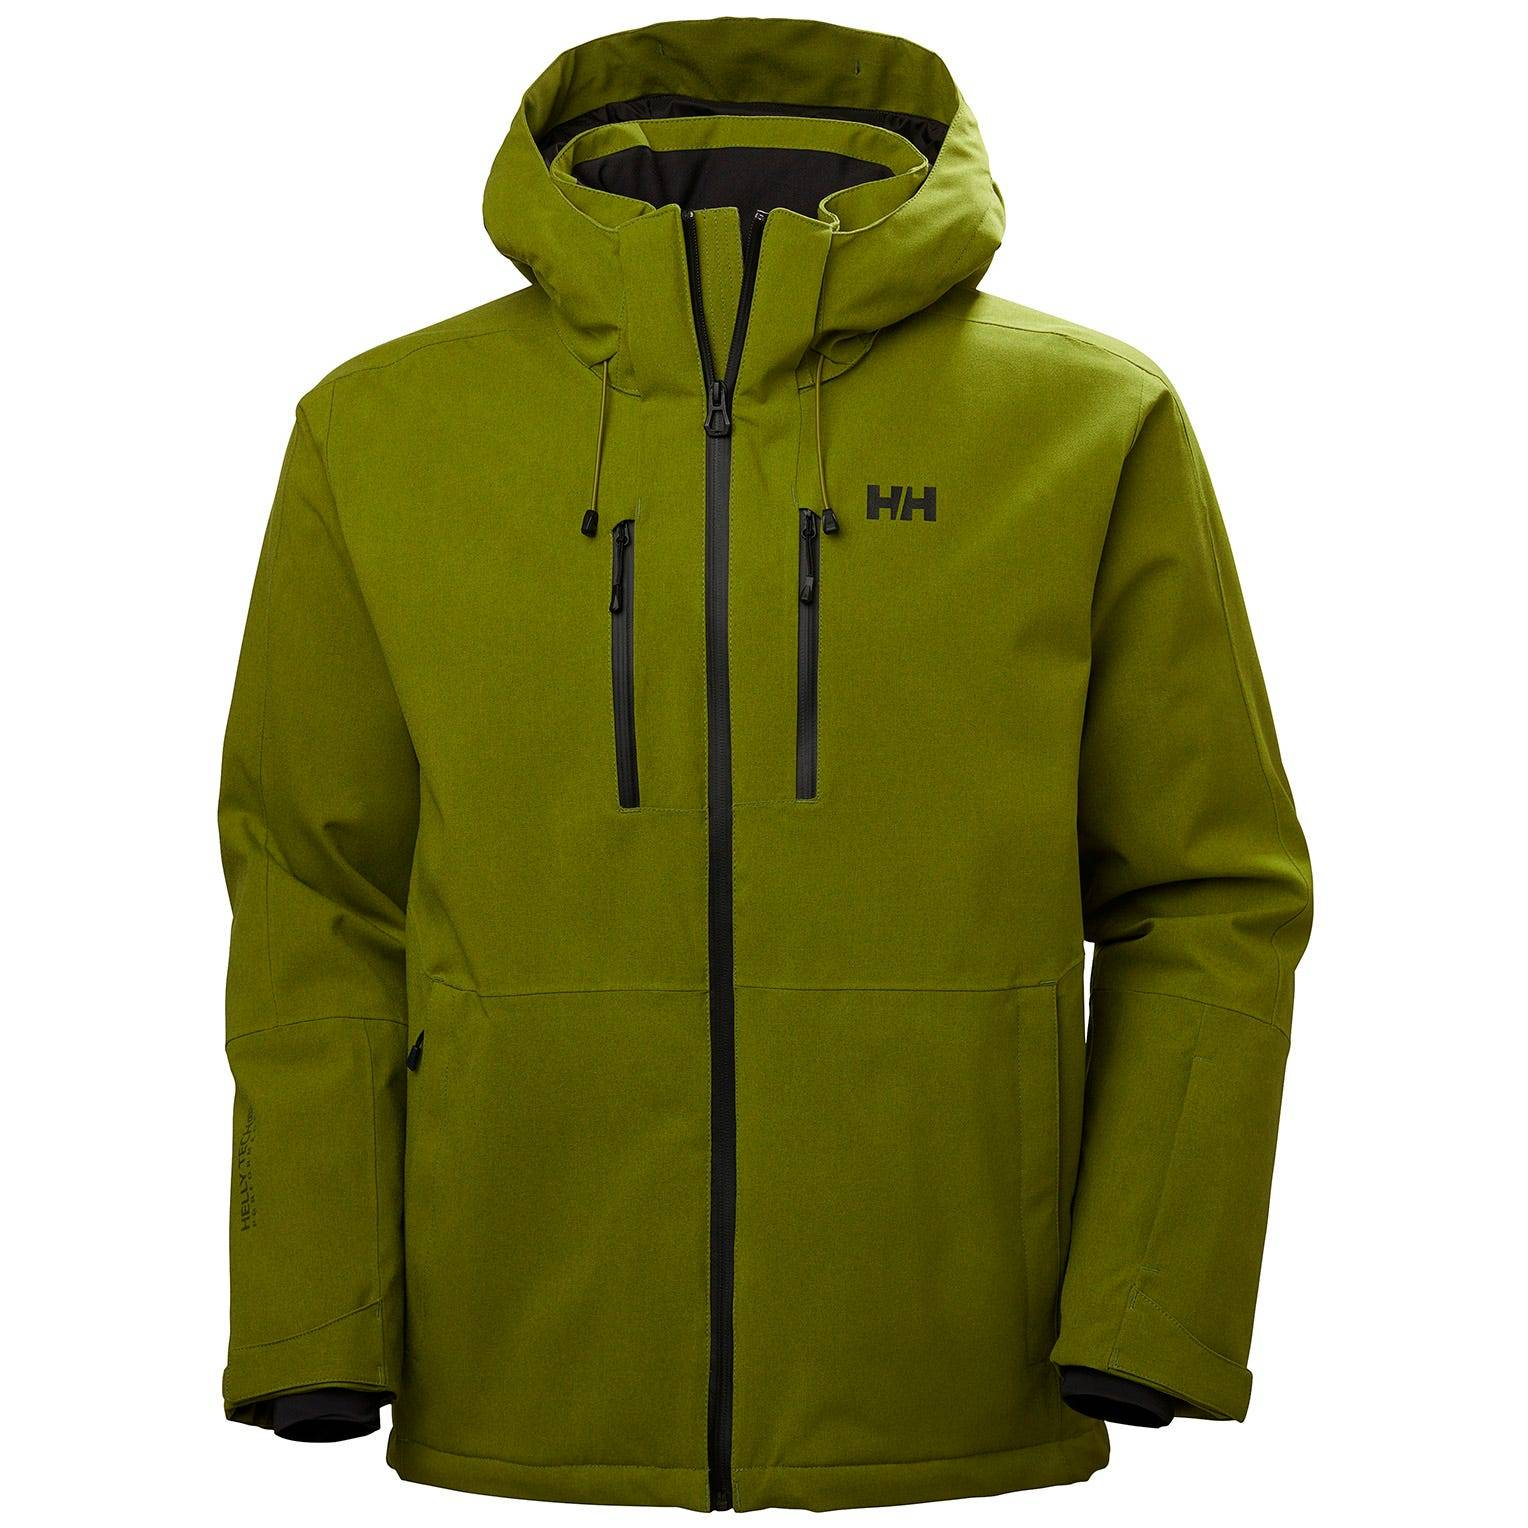 Helly Hansen Juniper 3.0 Jacket Mens Yellow XL